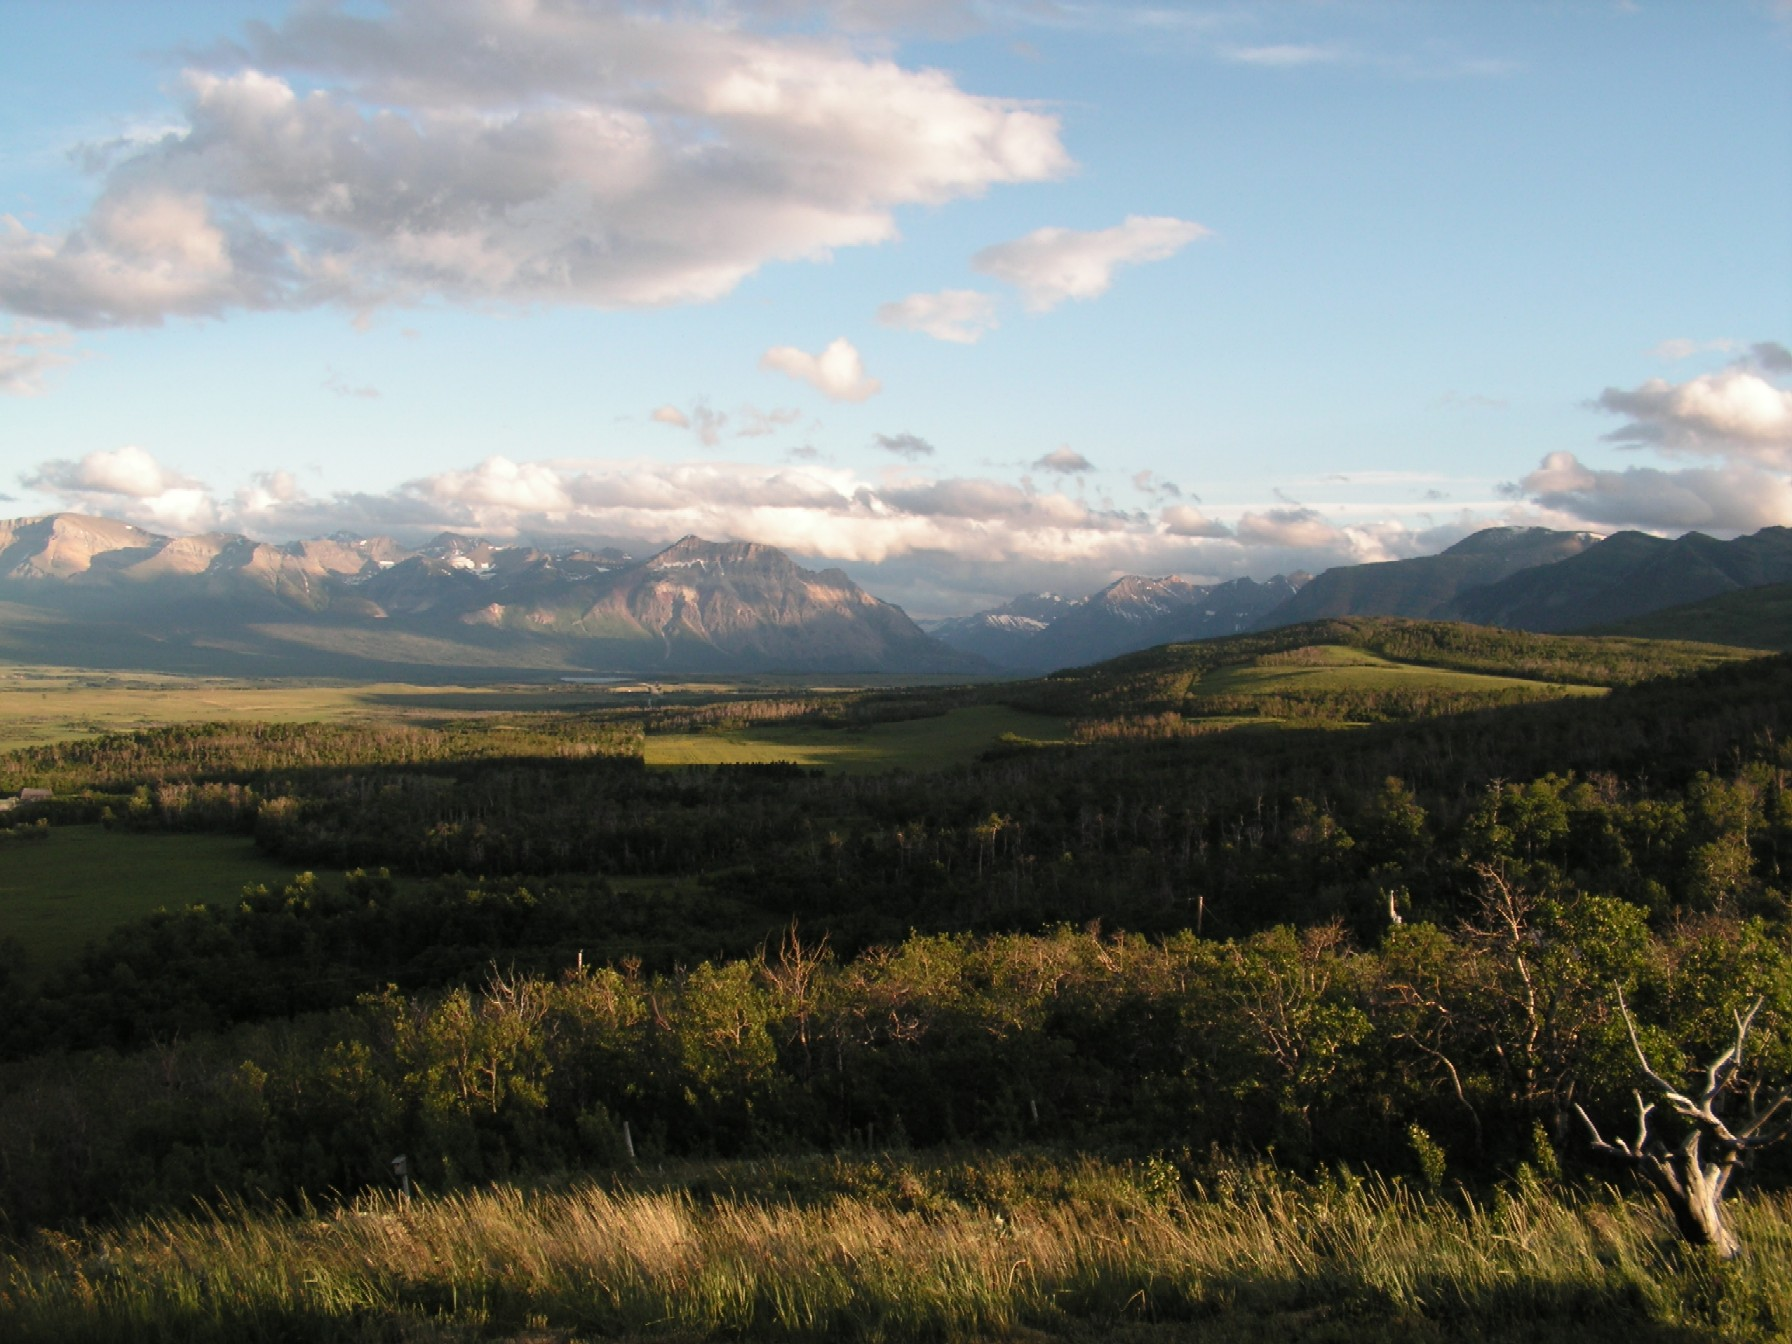 Landscape photograph of Waterton Park in Alberta, Canada.